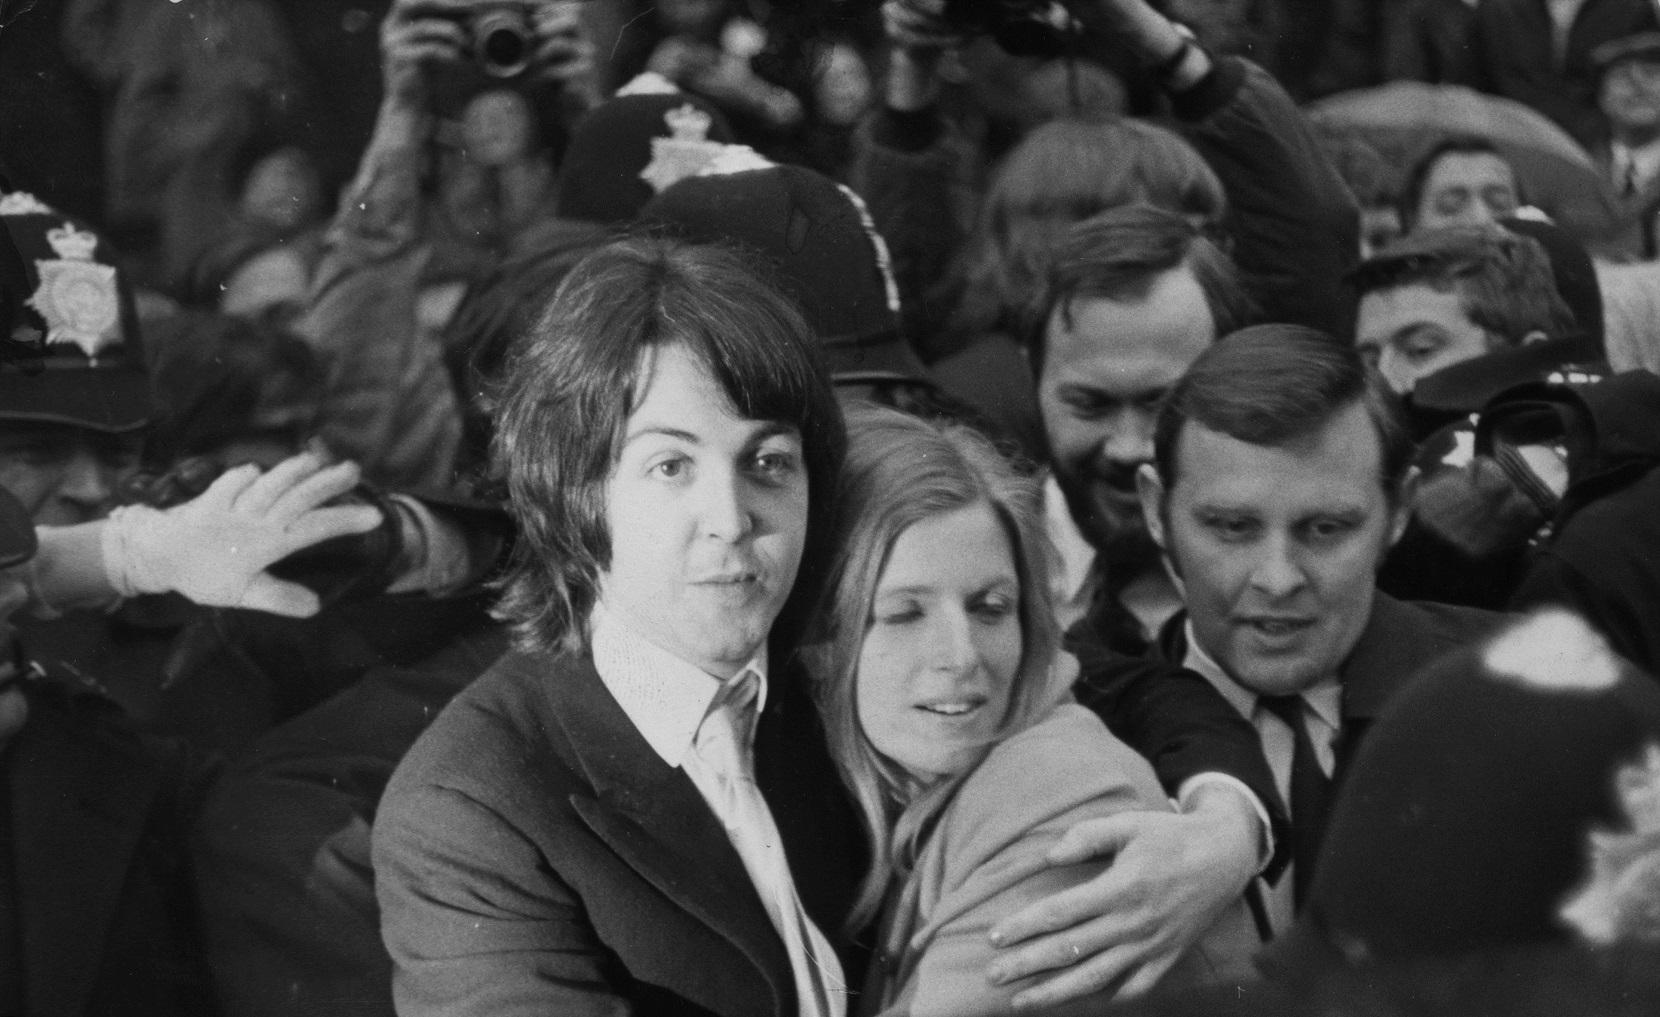 Paul McCartney marries Linda